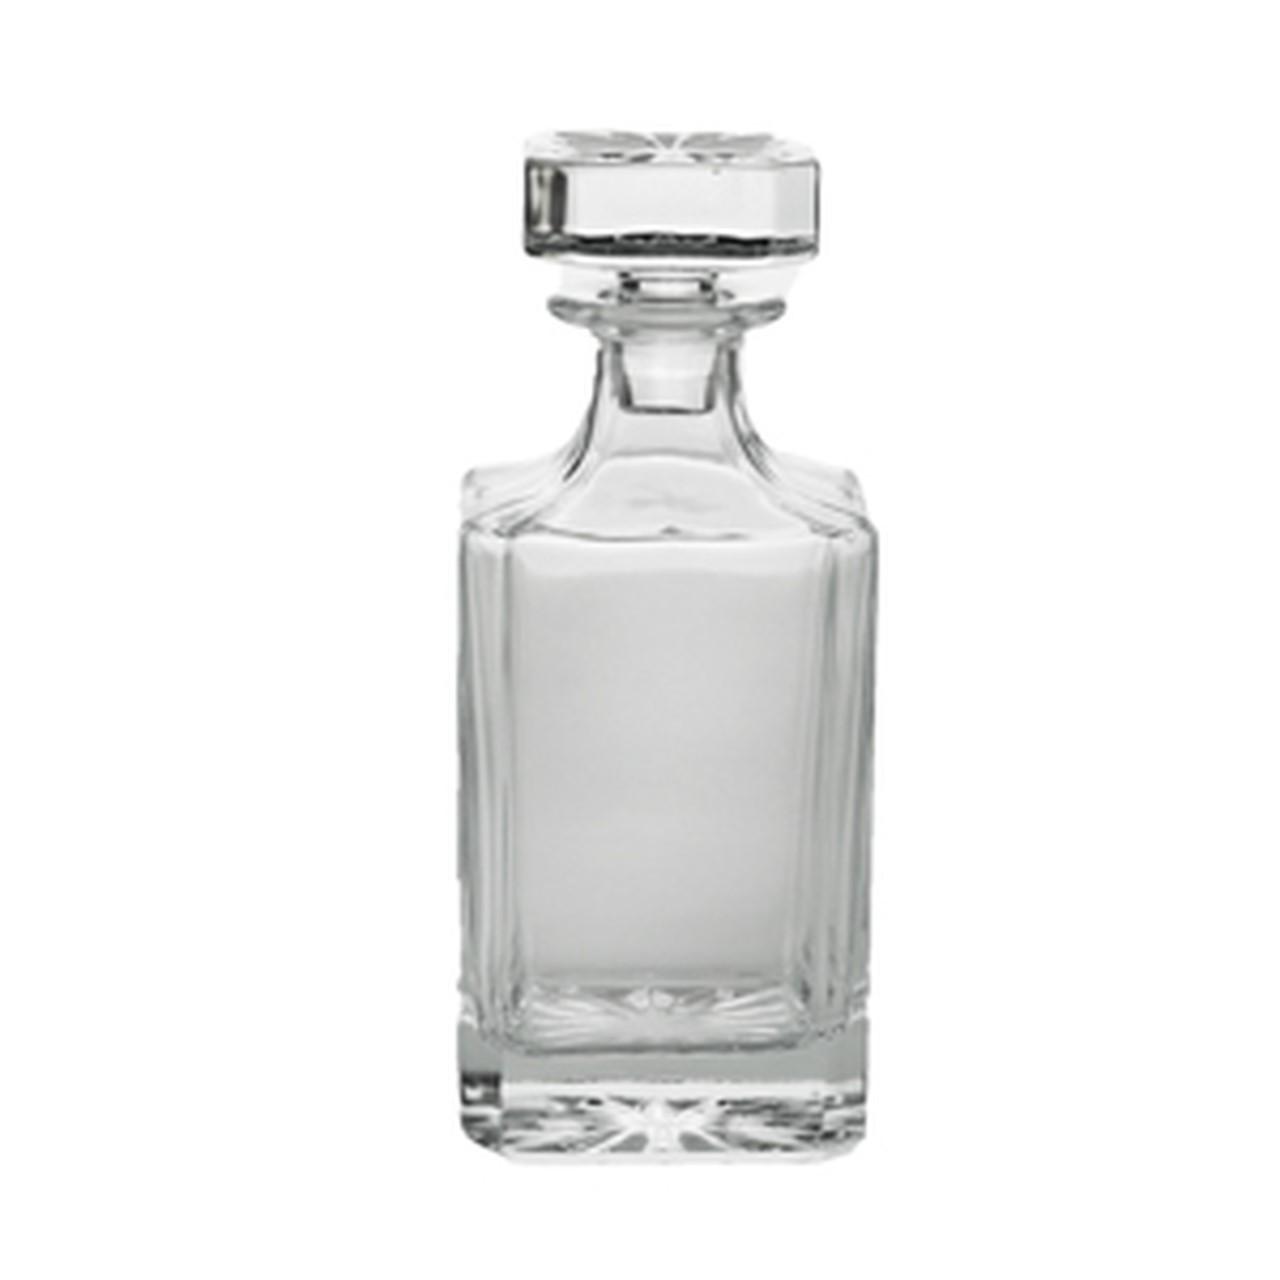 Garrafa Decanter 750ml para whisky de cristal Wolff - 27774